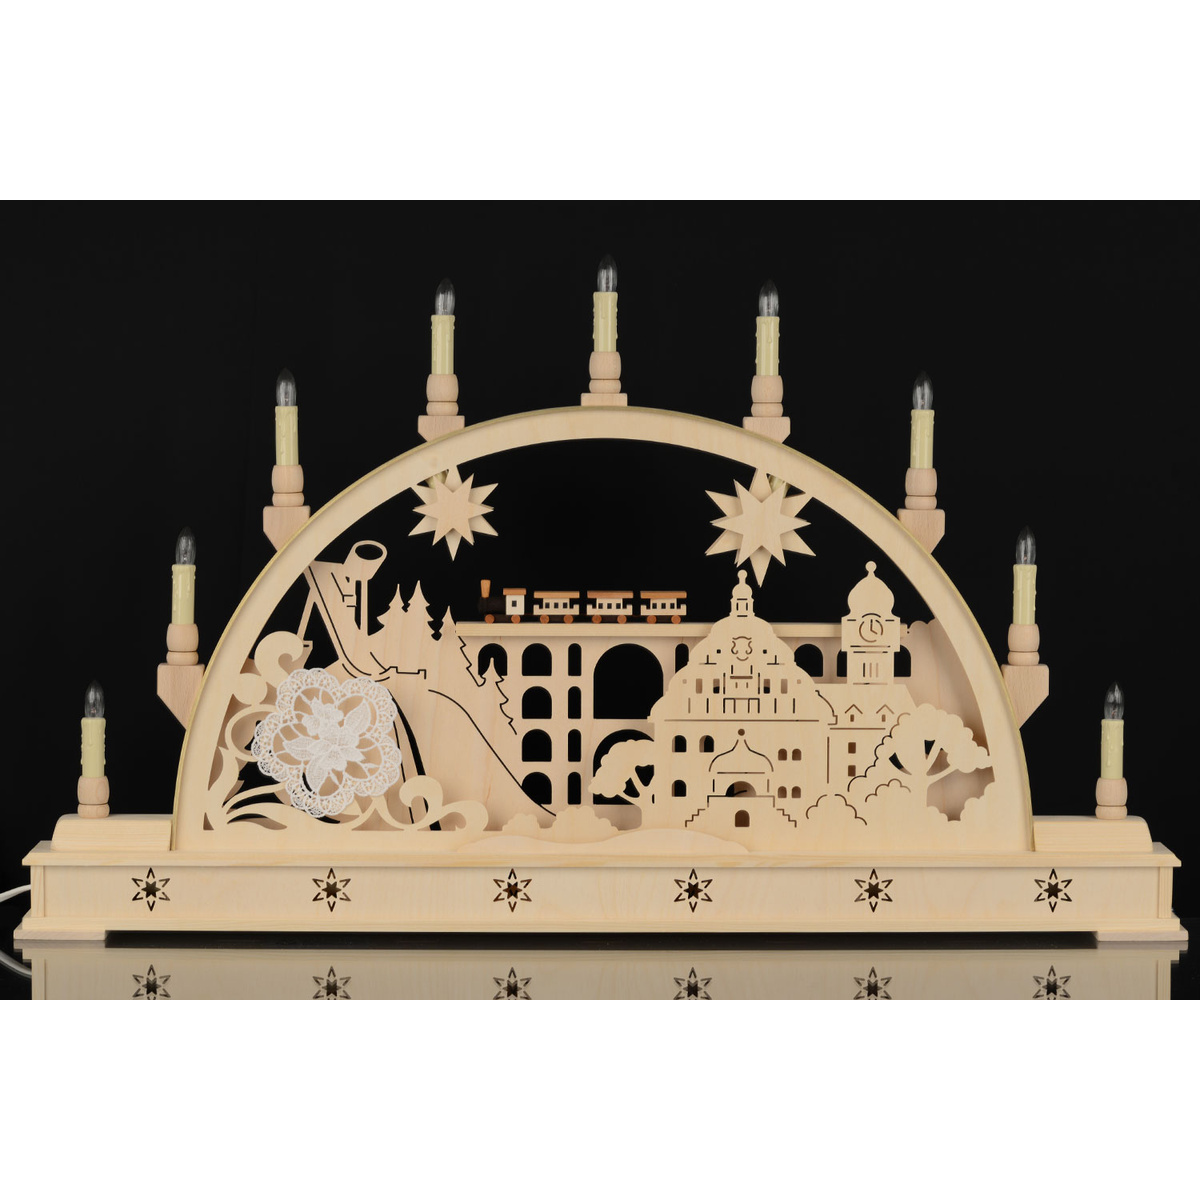 seidel schwibbogen vogtland mit sockel 78 cm von holger seidel f r 205 2 kaufen. Black Bedroom Furniture Sets. Home Design Ideas